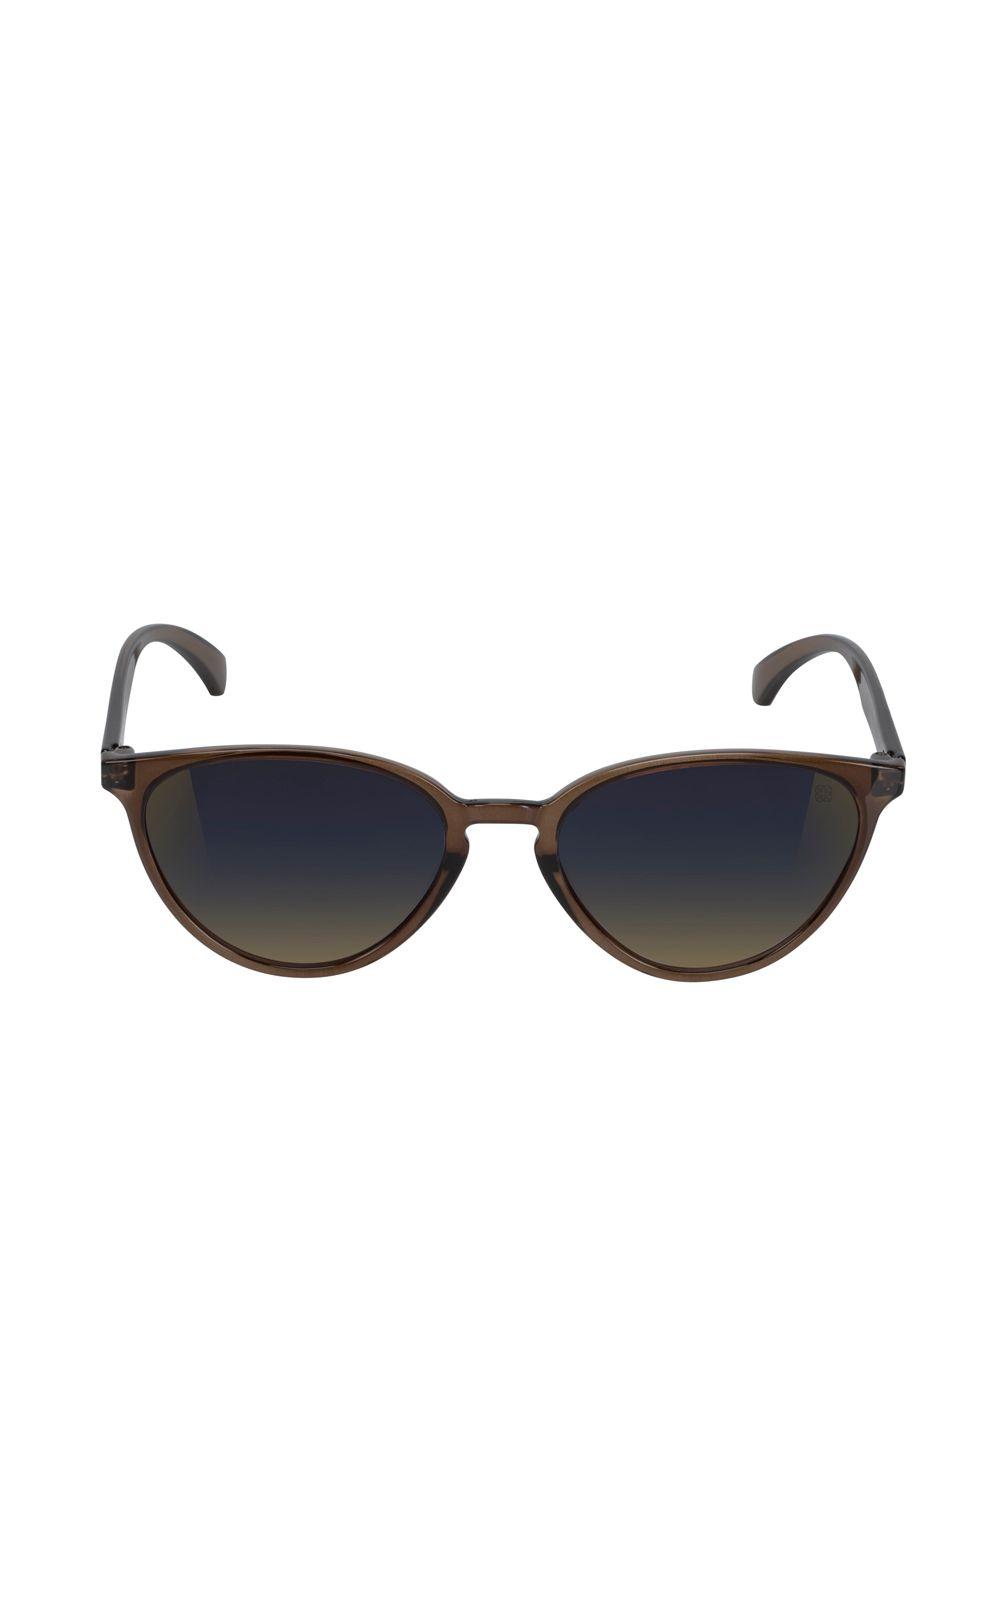 Foto 1 - Óculos Euro Geometric Trendy Marrom E0040J0827/8M